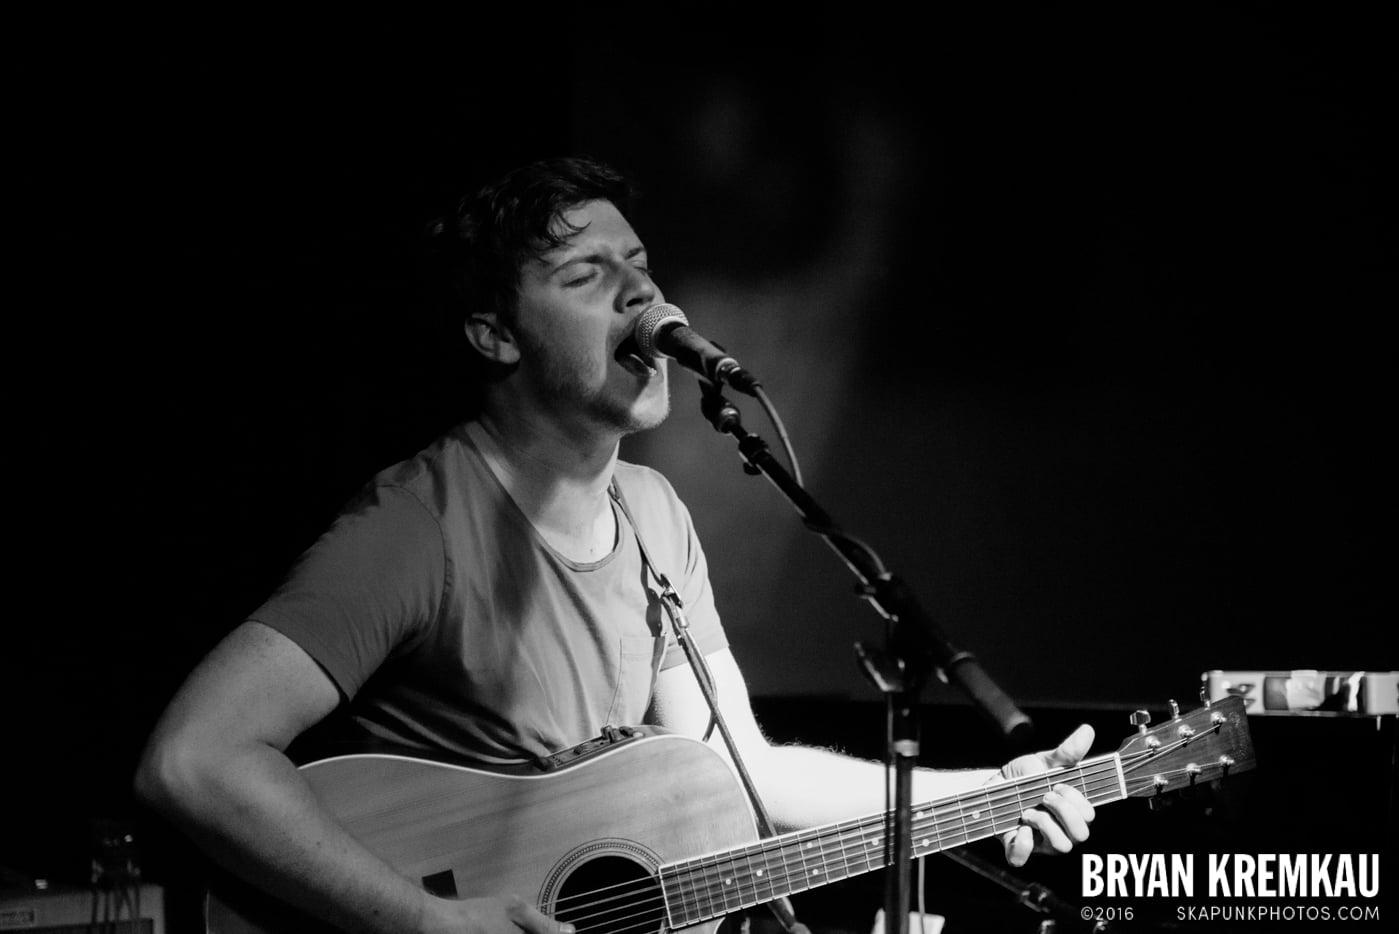 Jordan Klassen @ Bowery Electric, NYC - 10.9.13 (1)